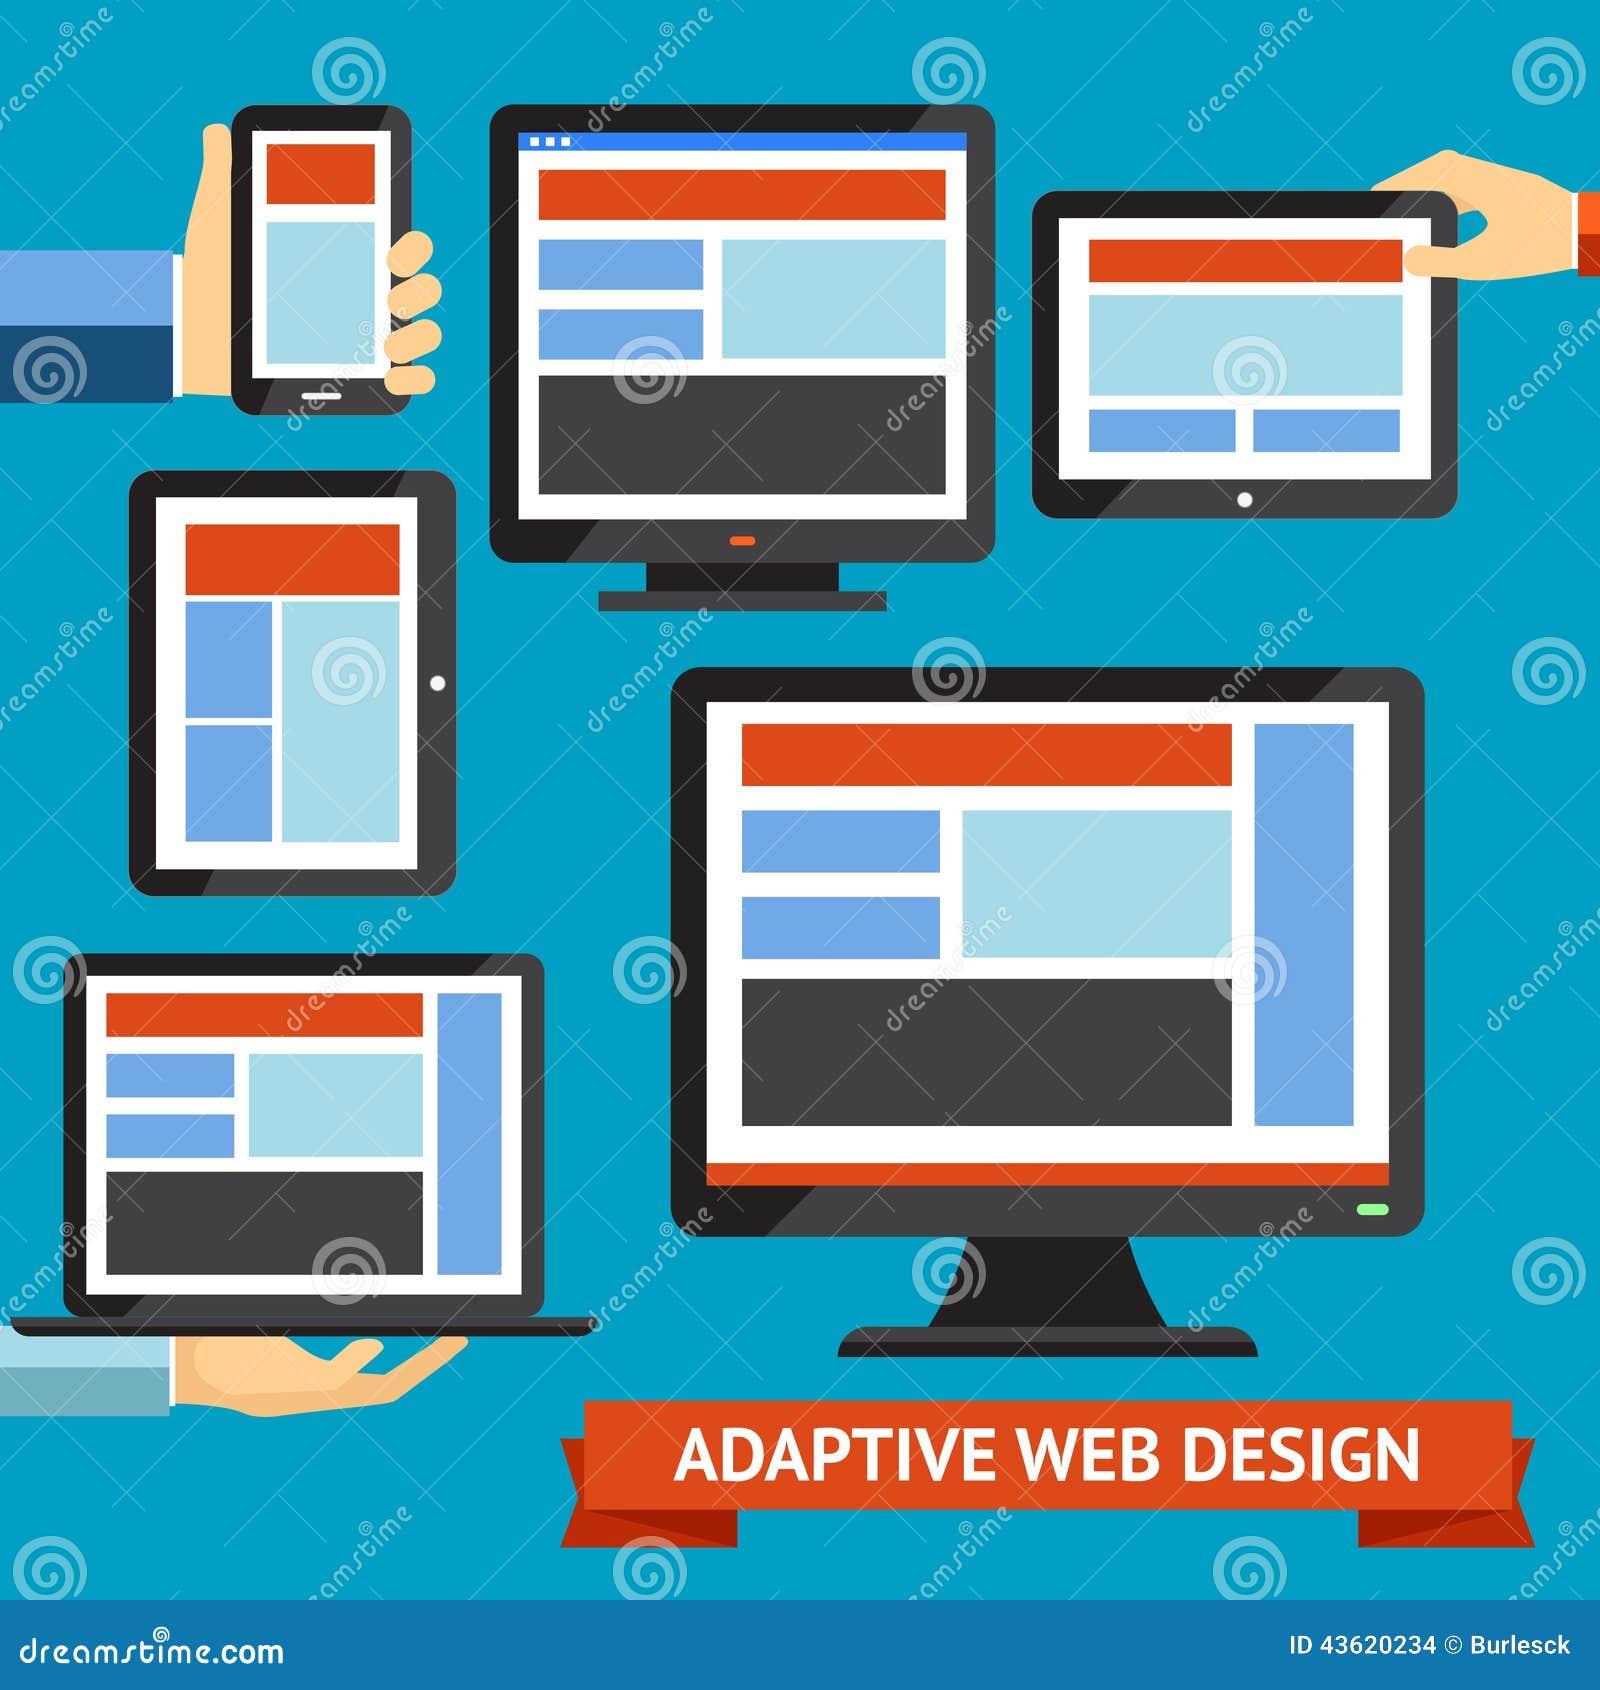 Responsive Web Design Flat Graphics Vector: Responsive And Adaptive Design Stock Vector